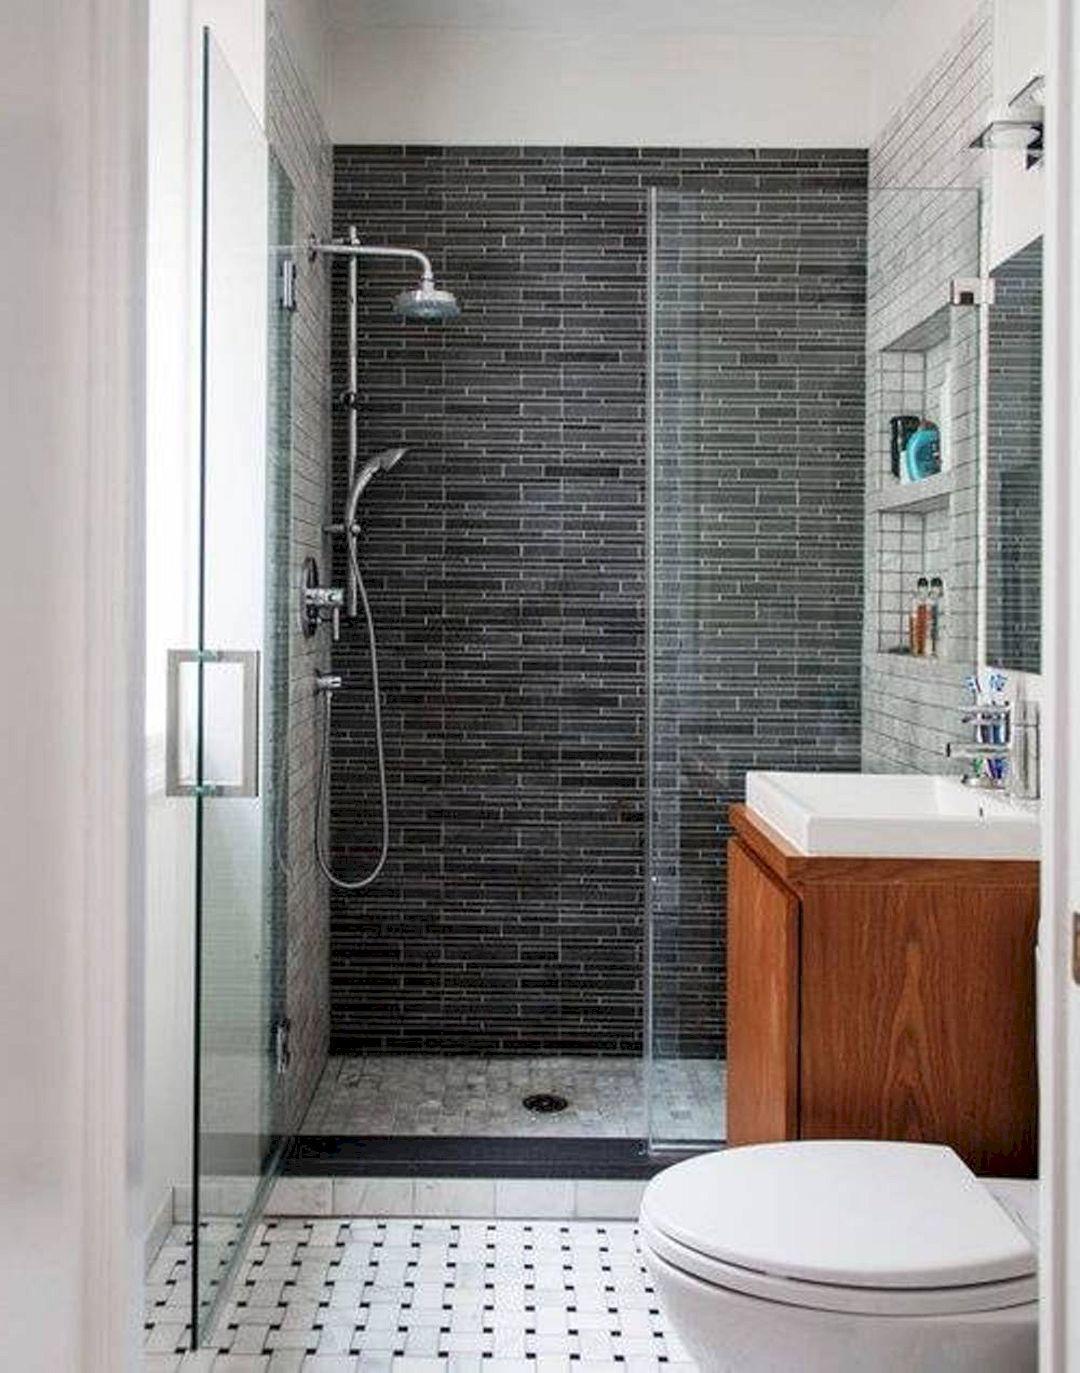 16 Small Bathroom Renovation Ideas Cheap Bathroom Remodel Small Bathroom Remodel Bathroom Layout